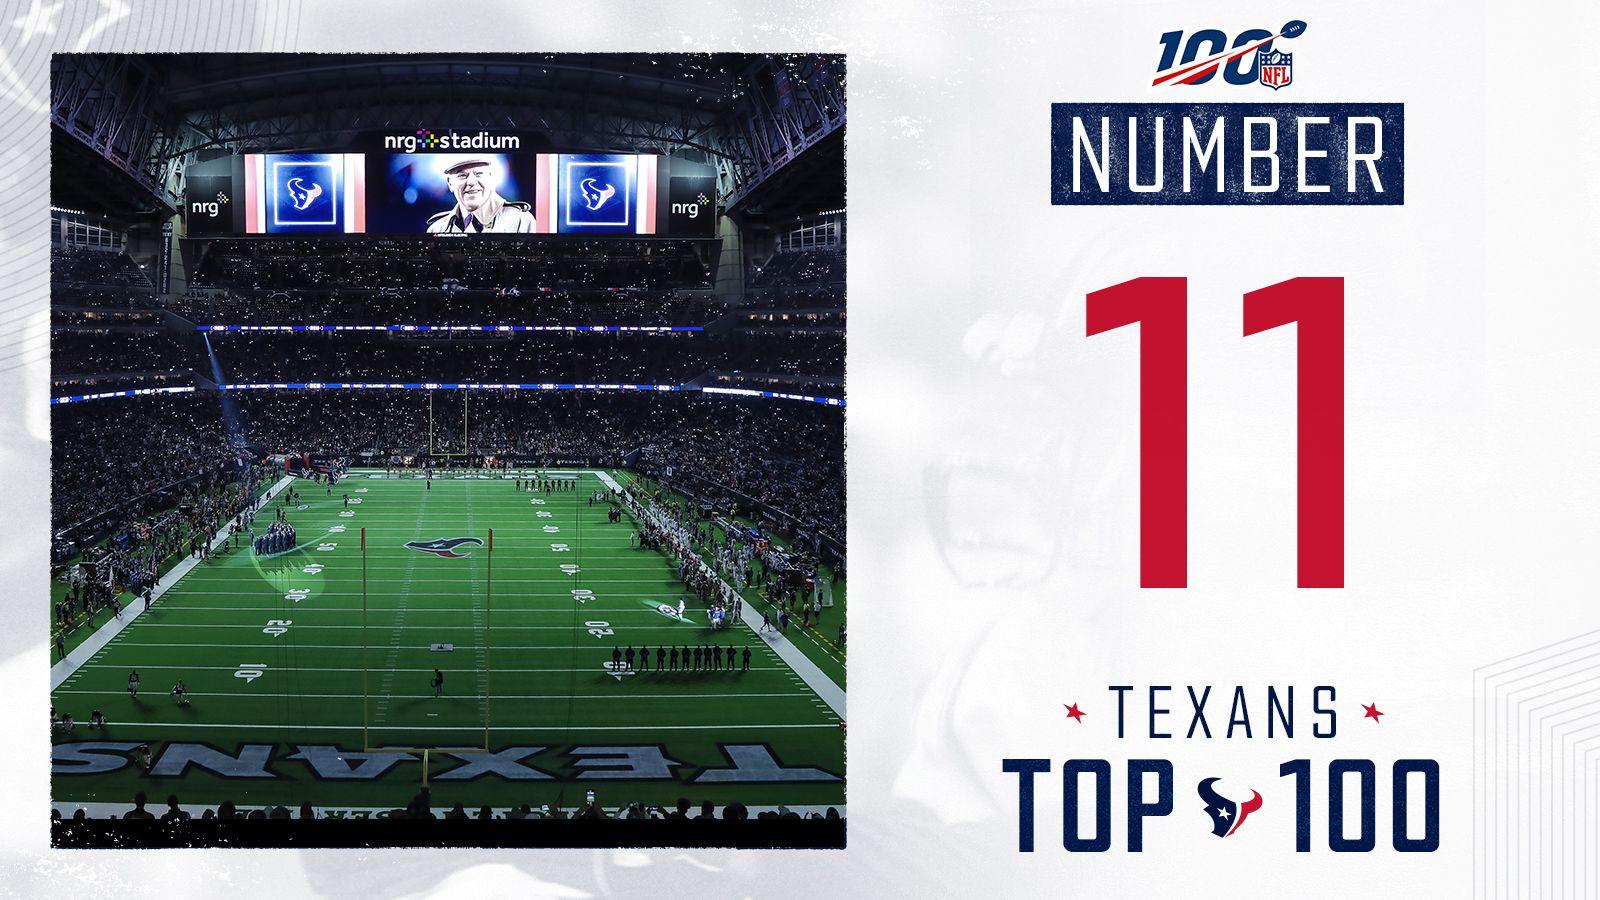 11_RCM passes aways, Texans beat the Titans - TWITTER